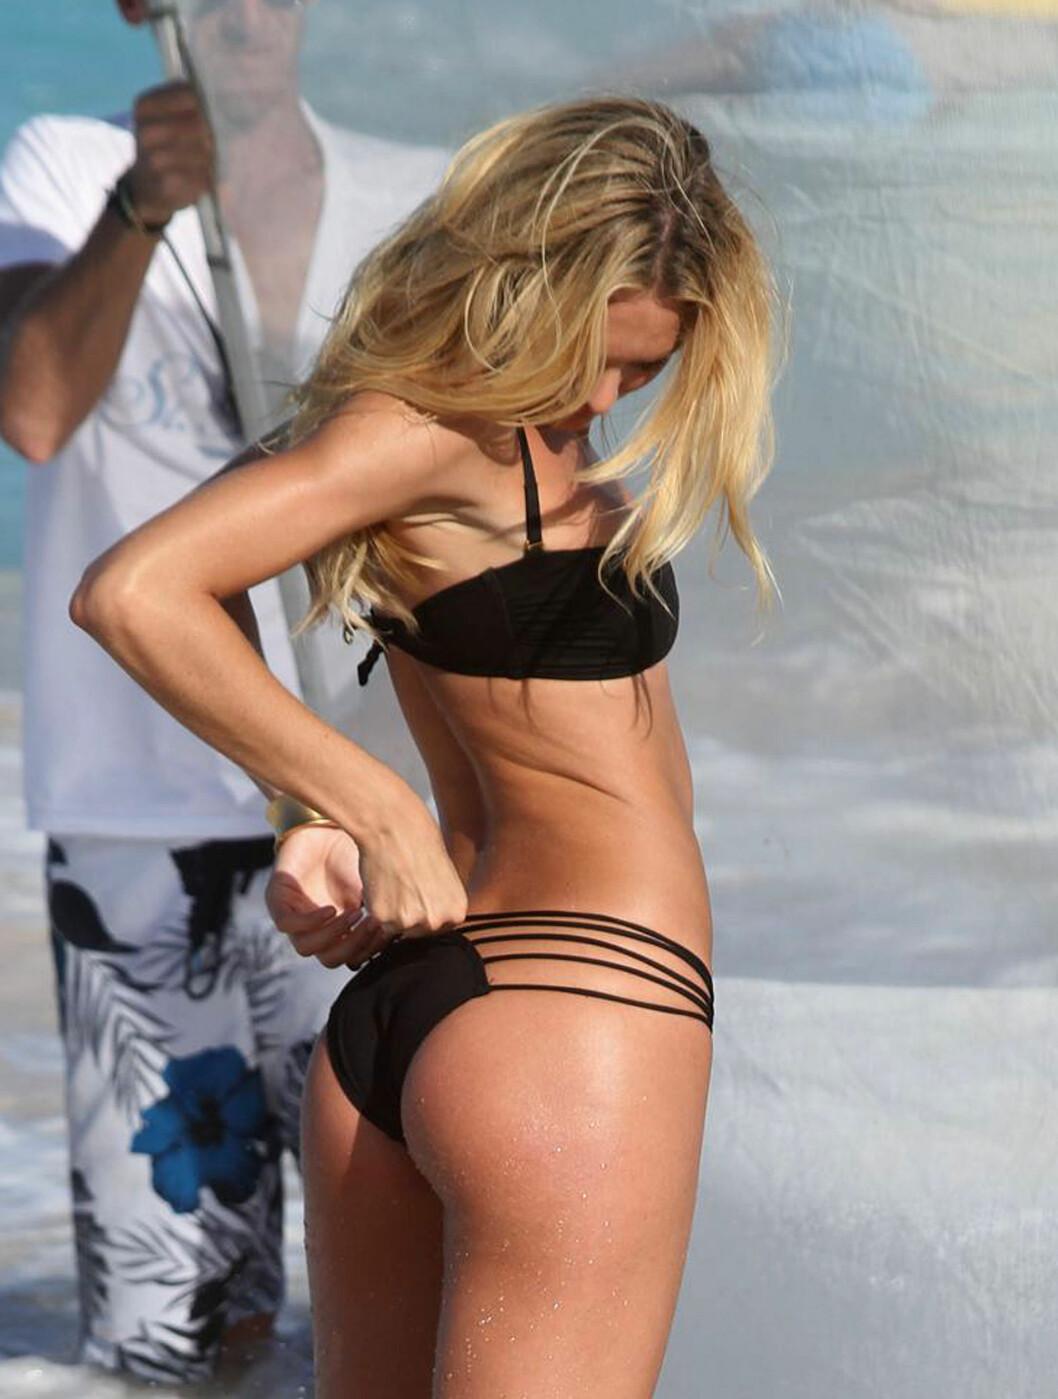 EN HJELPENDE HÅND: Candice sjekker at bikinien sitter som den skal. Foto: Stella Pictures